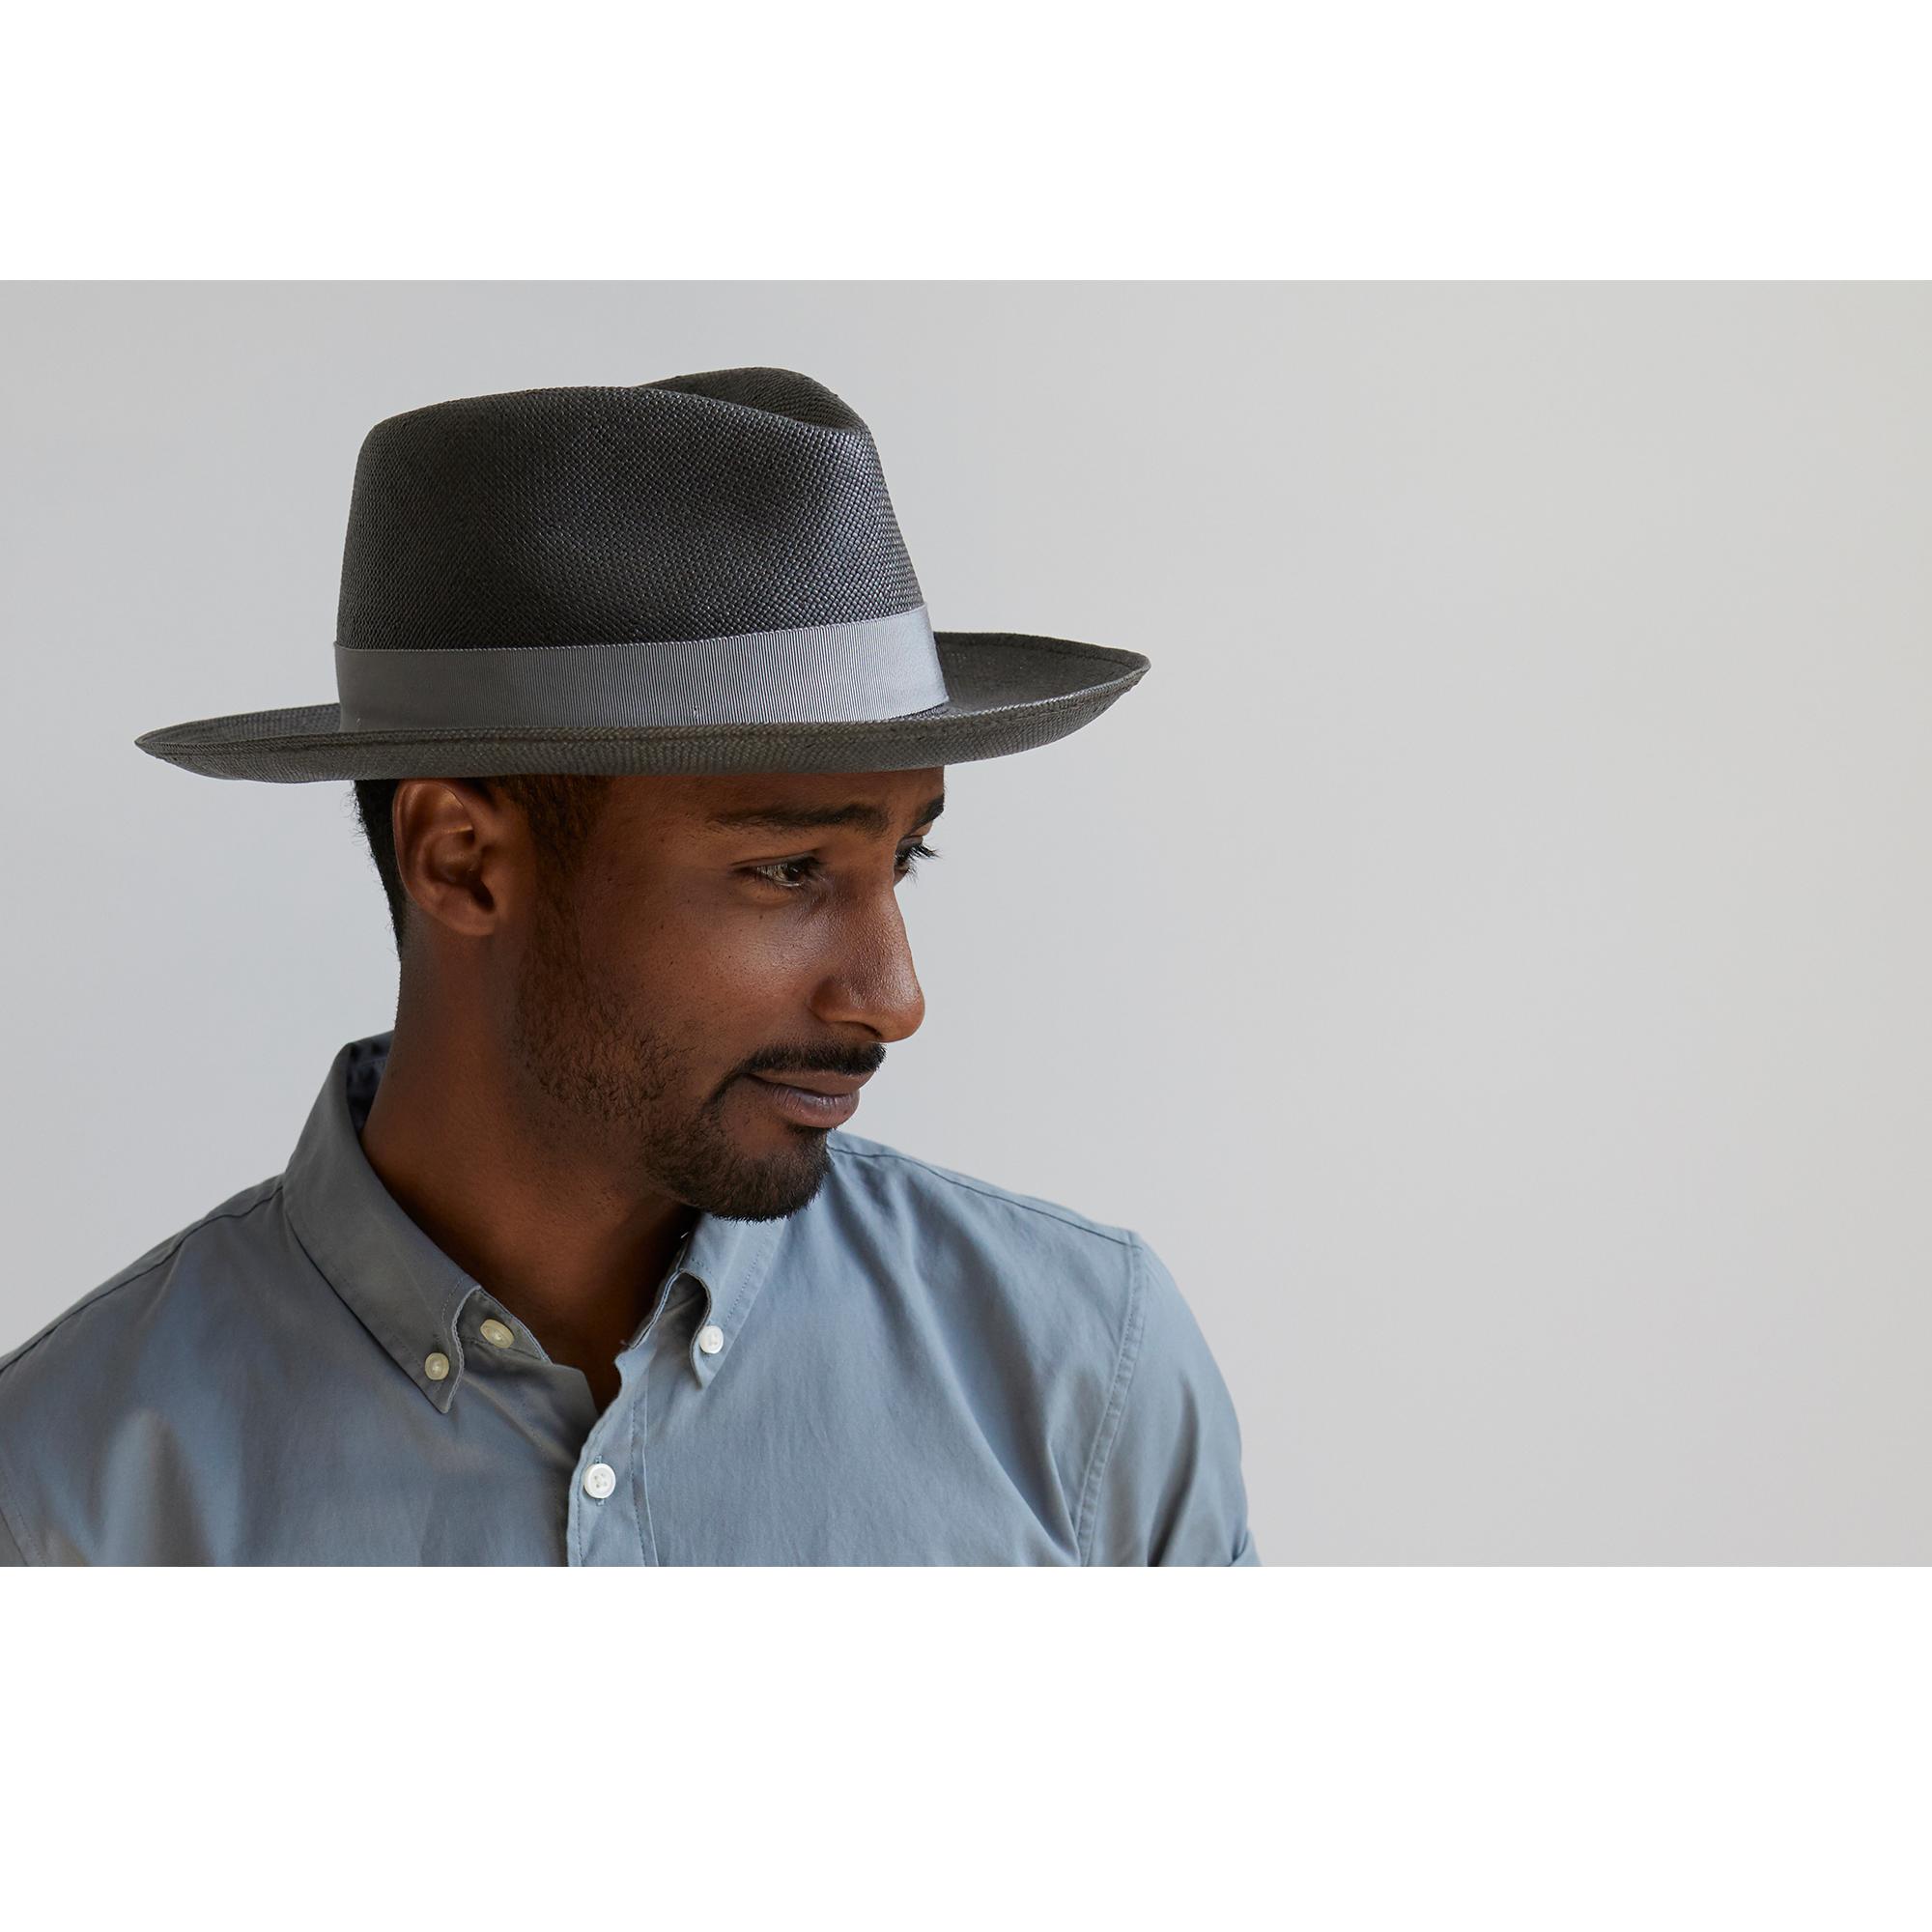 Goorin Mr. Cash Brim Fedora Hat w/ Sweatband in Black, size Small